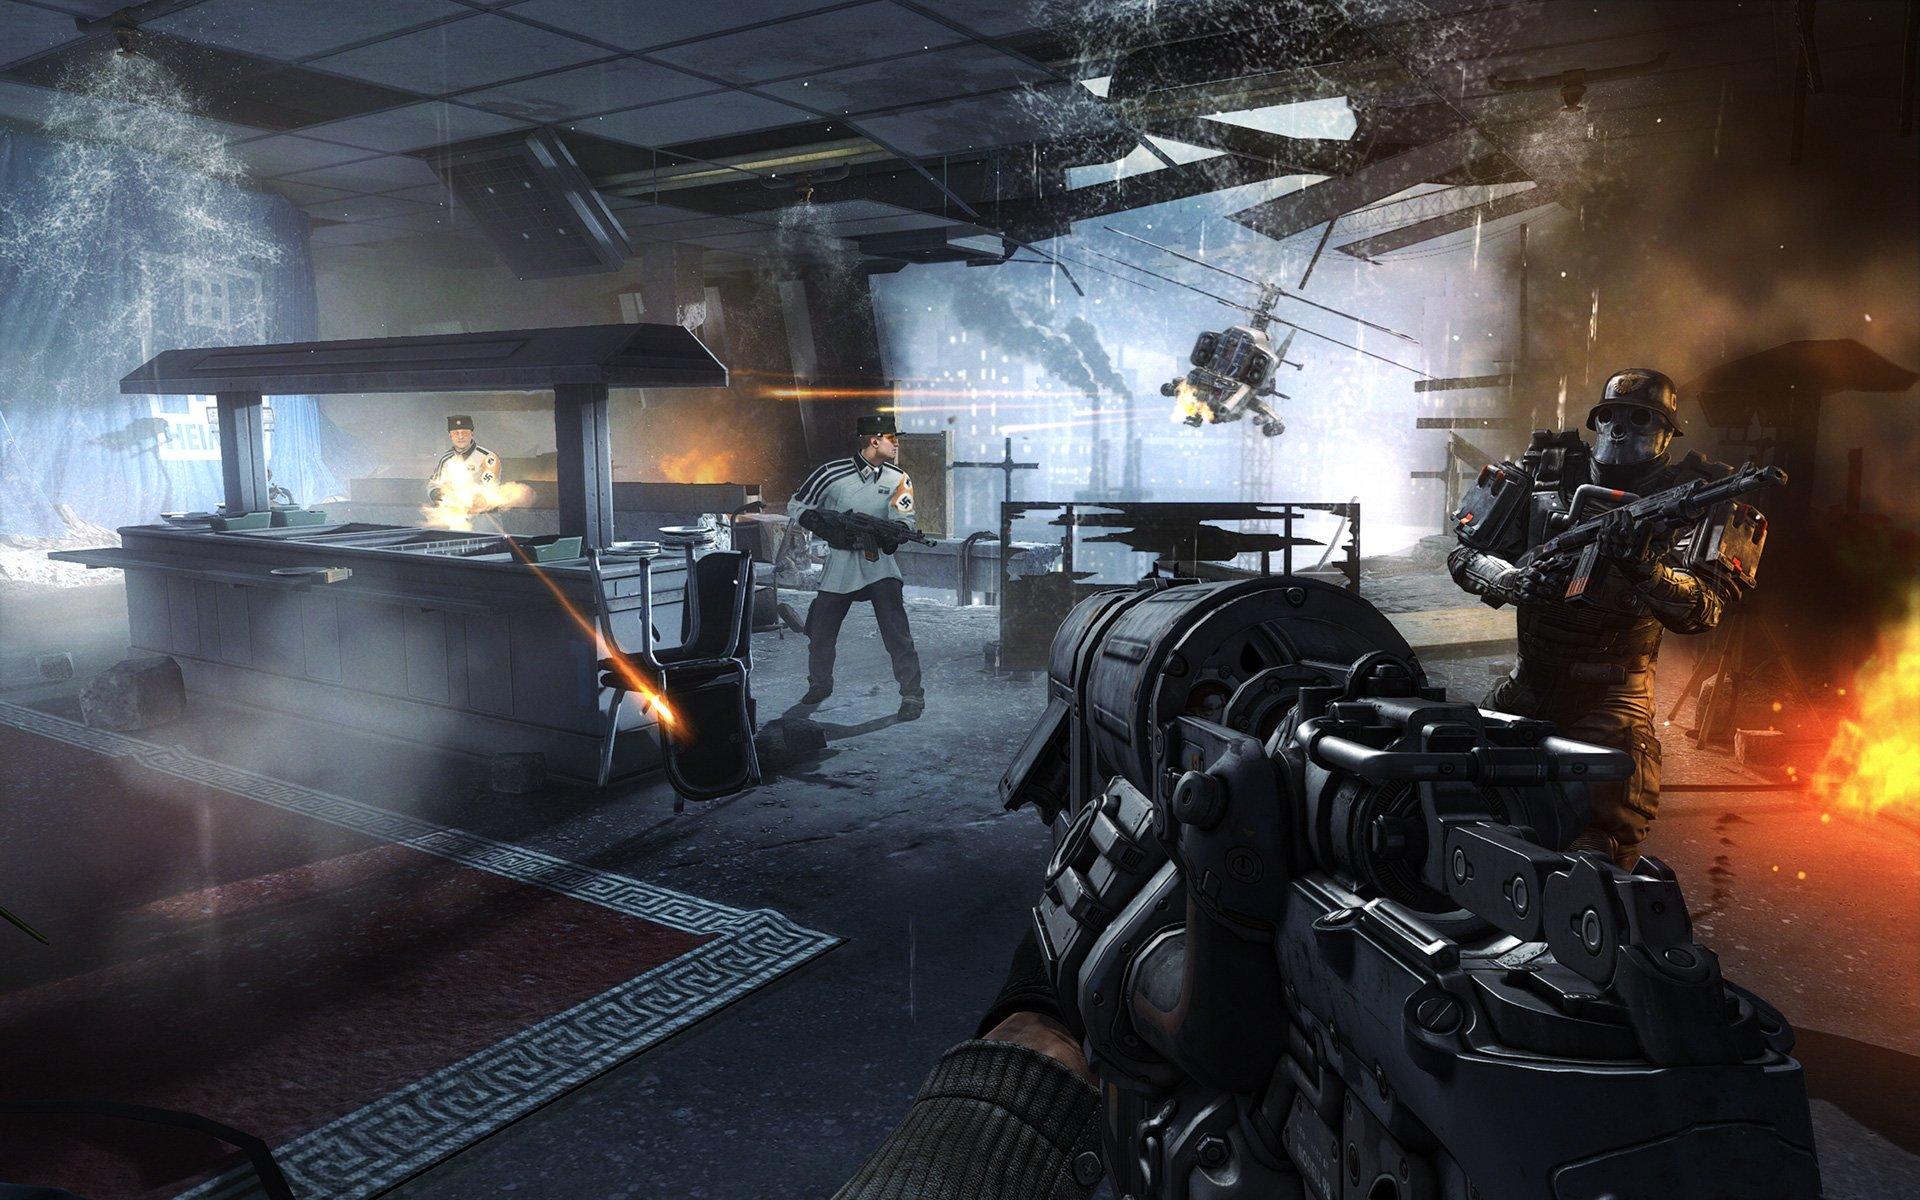 Скриншот к игре Wolfenstein: The New Order [1.0.0.2 (35939)] (2014) PC | RePack от R.G. Механики